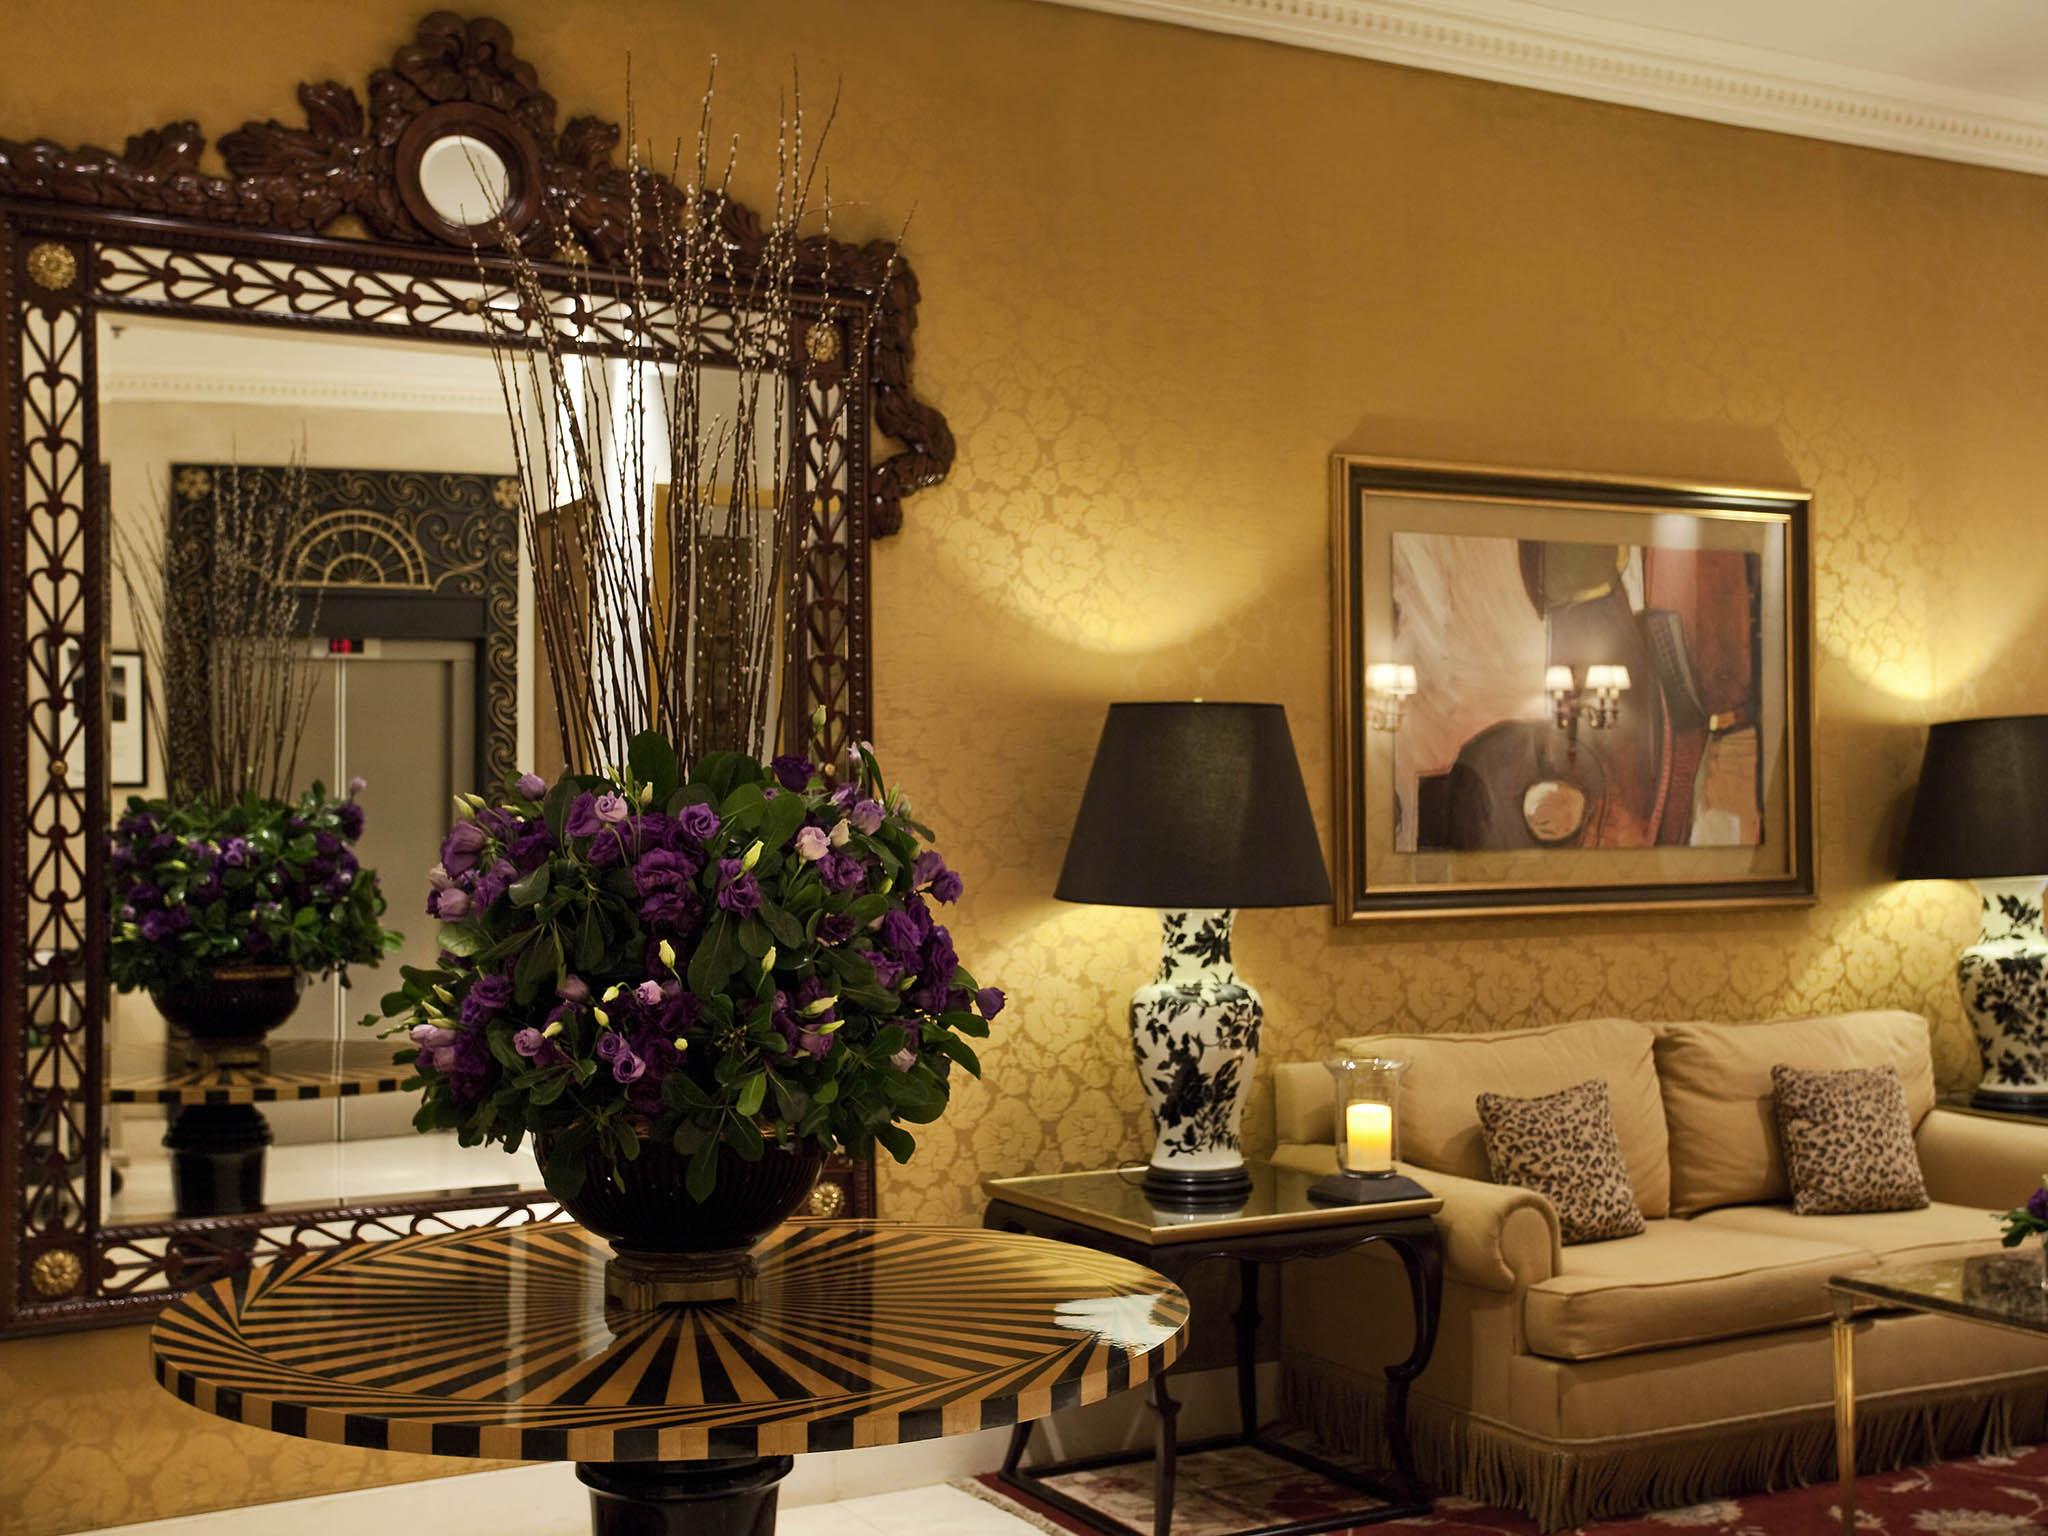 Hotel Nova Kd Comfort Hotel In Buenos Aires Sofitel Buenos Aires